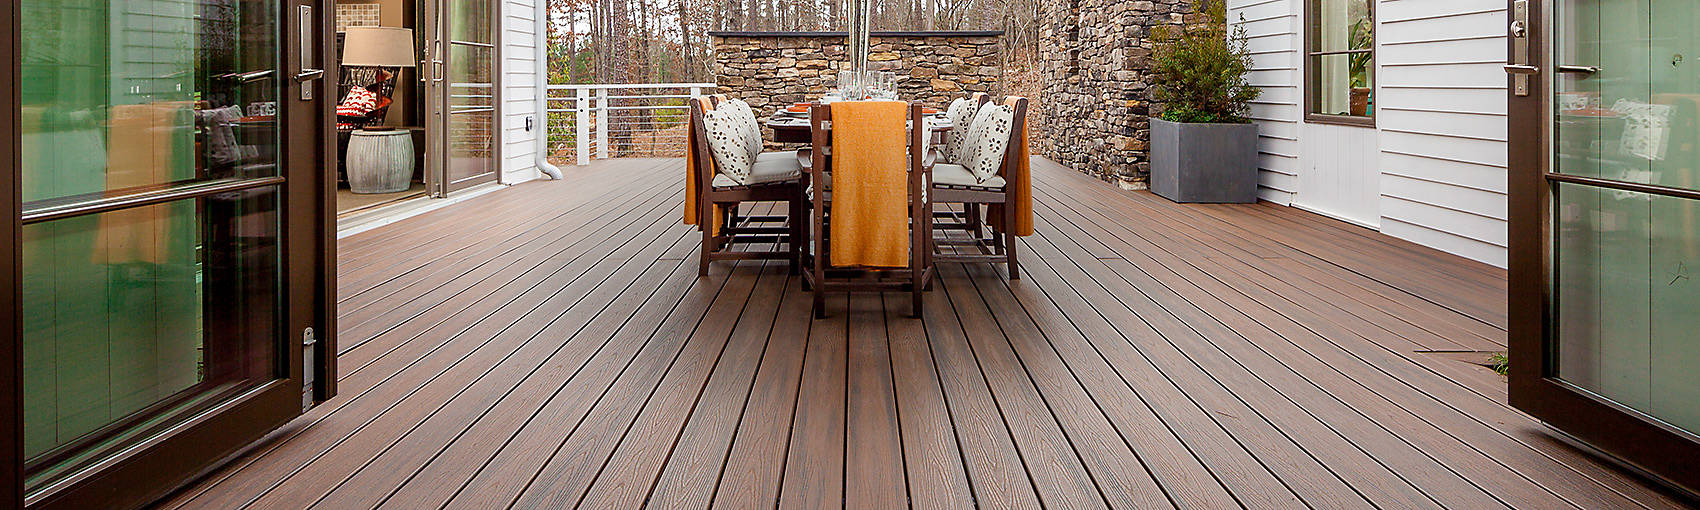 Composite Decking   Timbers U0026 Wood Alternative Decking | Trex